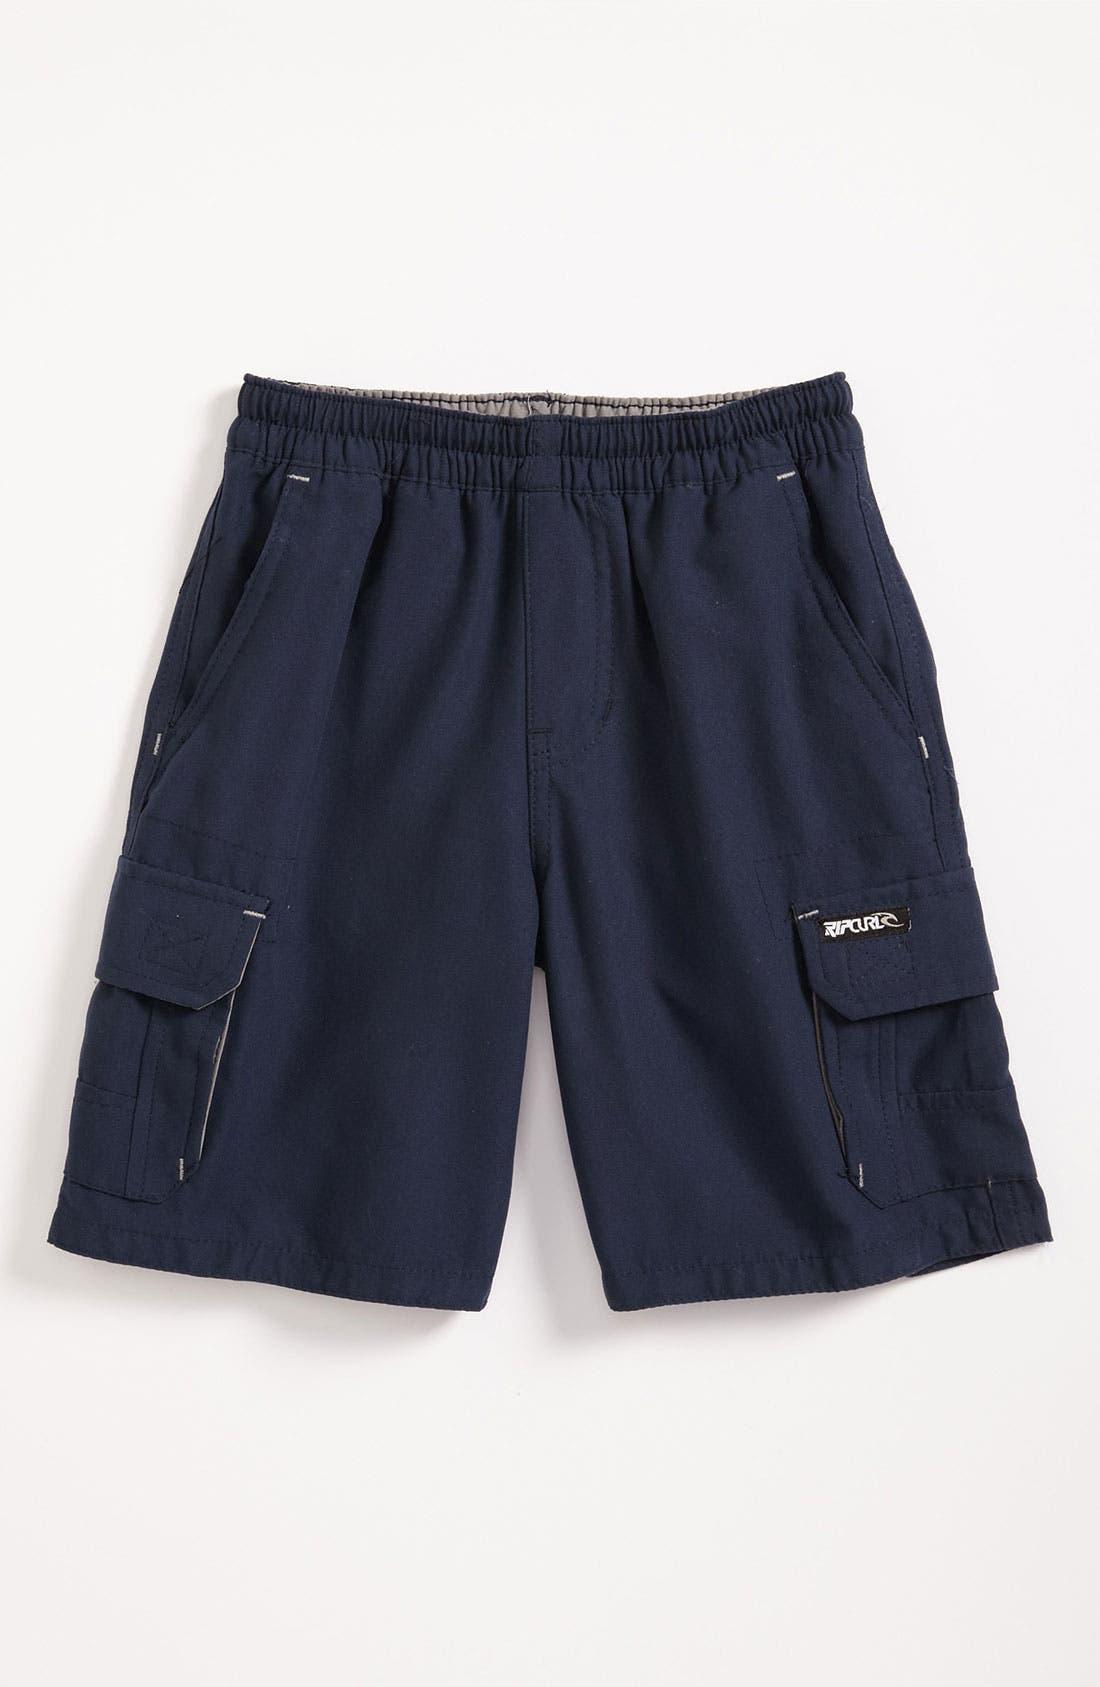 Alternate Image 1 Selected - Rip Curl 'Hamilton' Walking Shorts (Toddler)